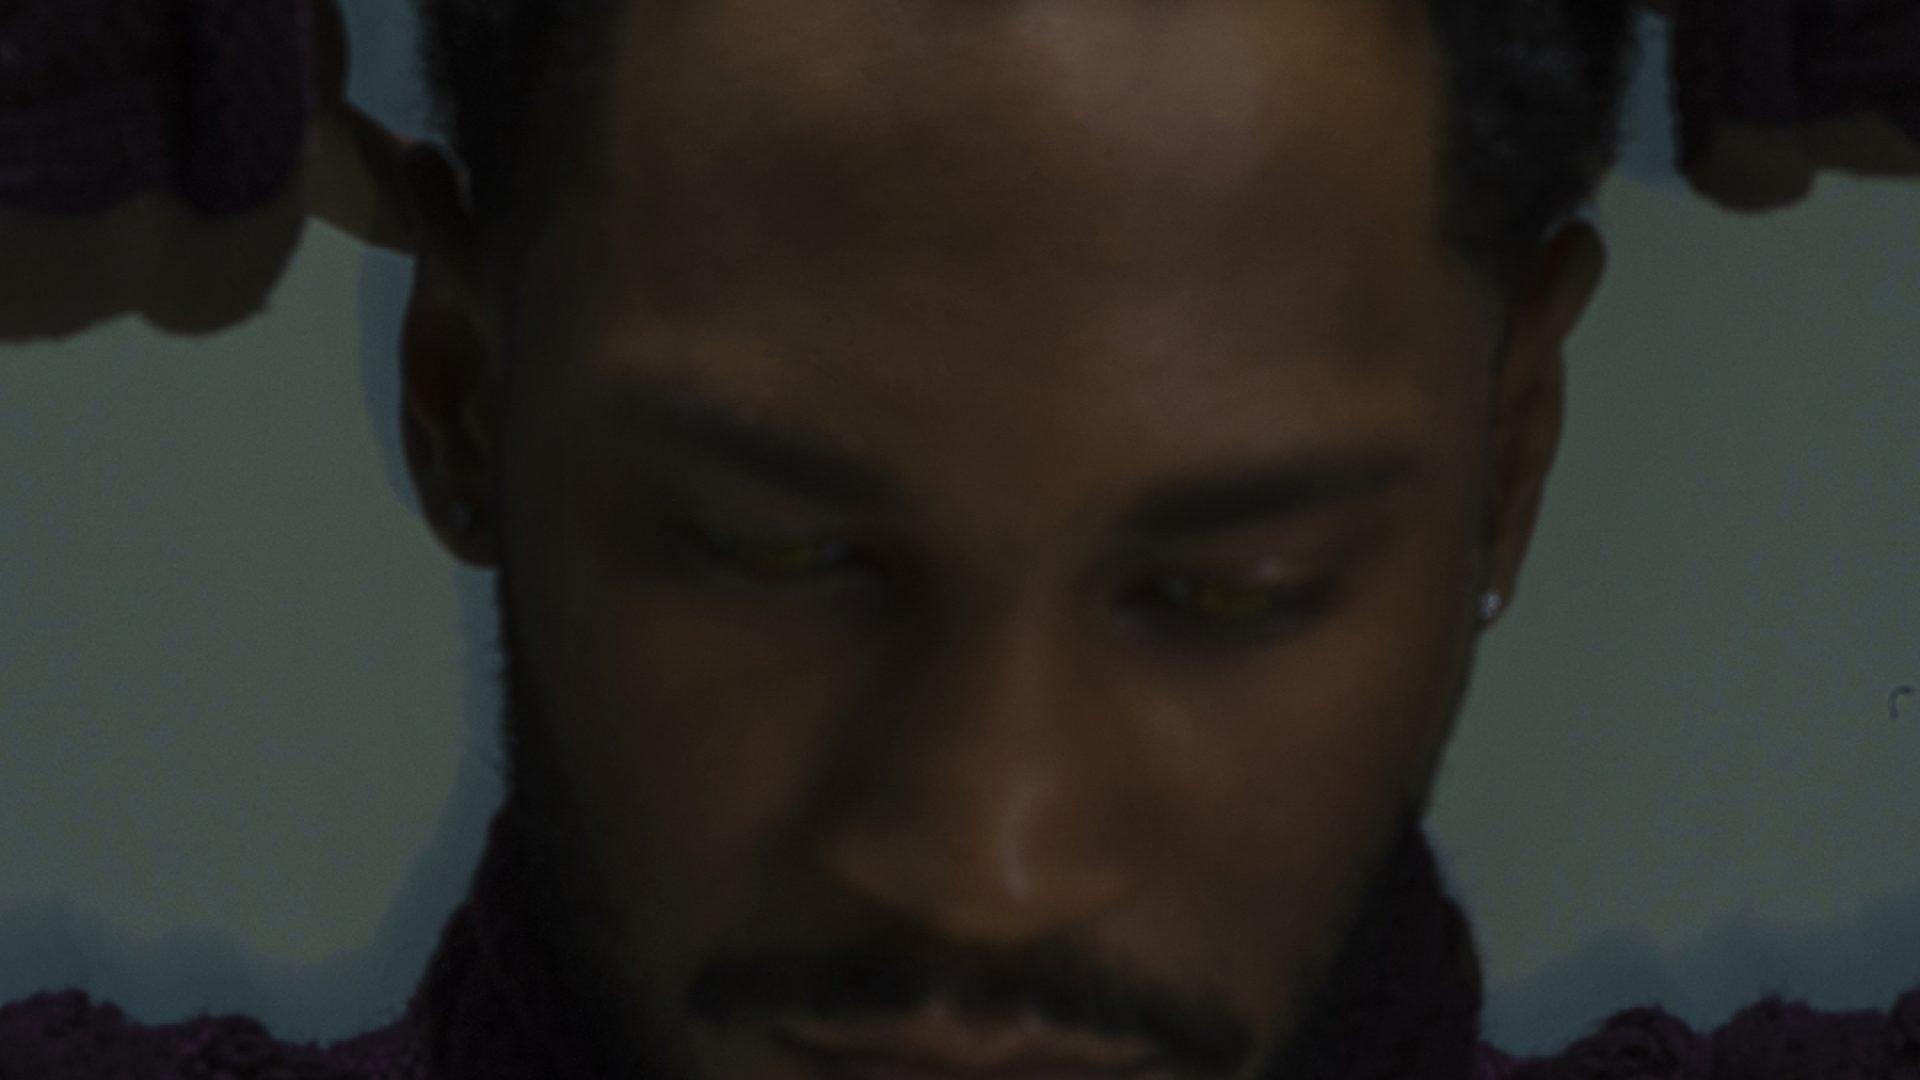 Michael B. Jordan Gets Sexy In Snoh Aalegra's Latest Video